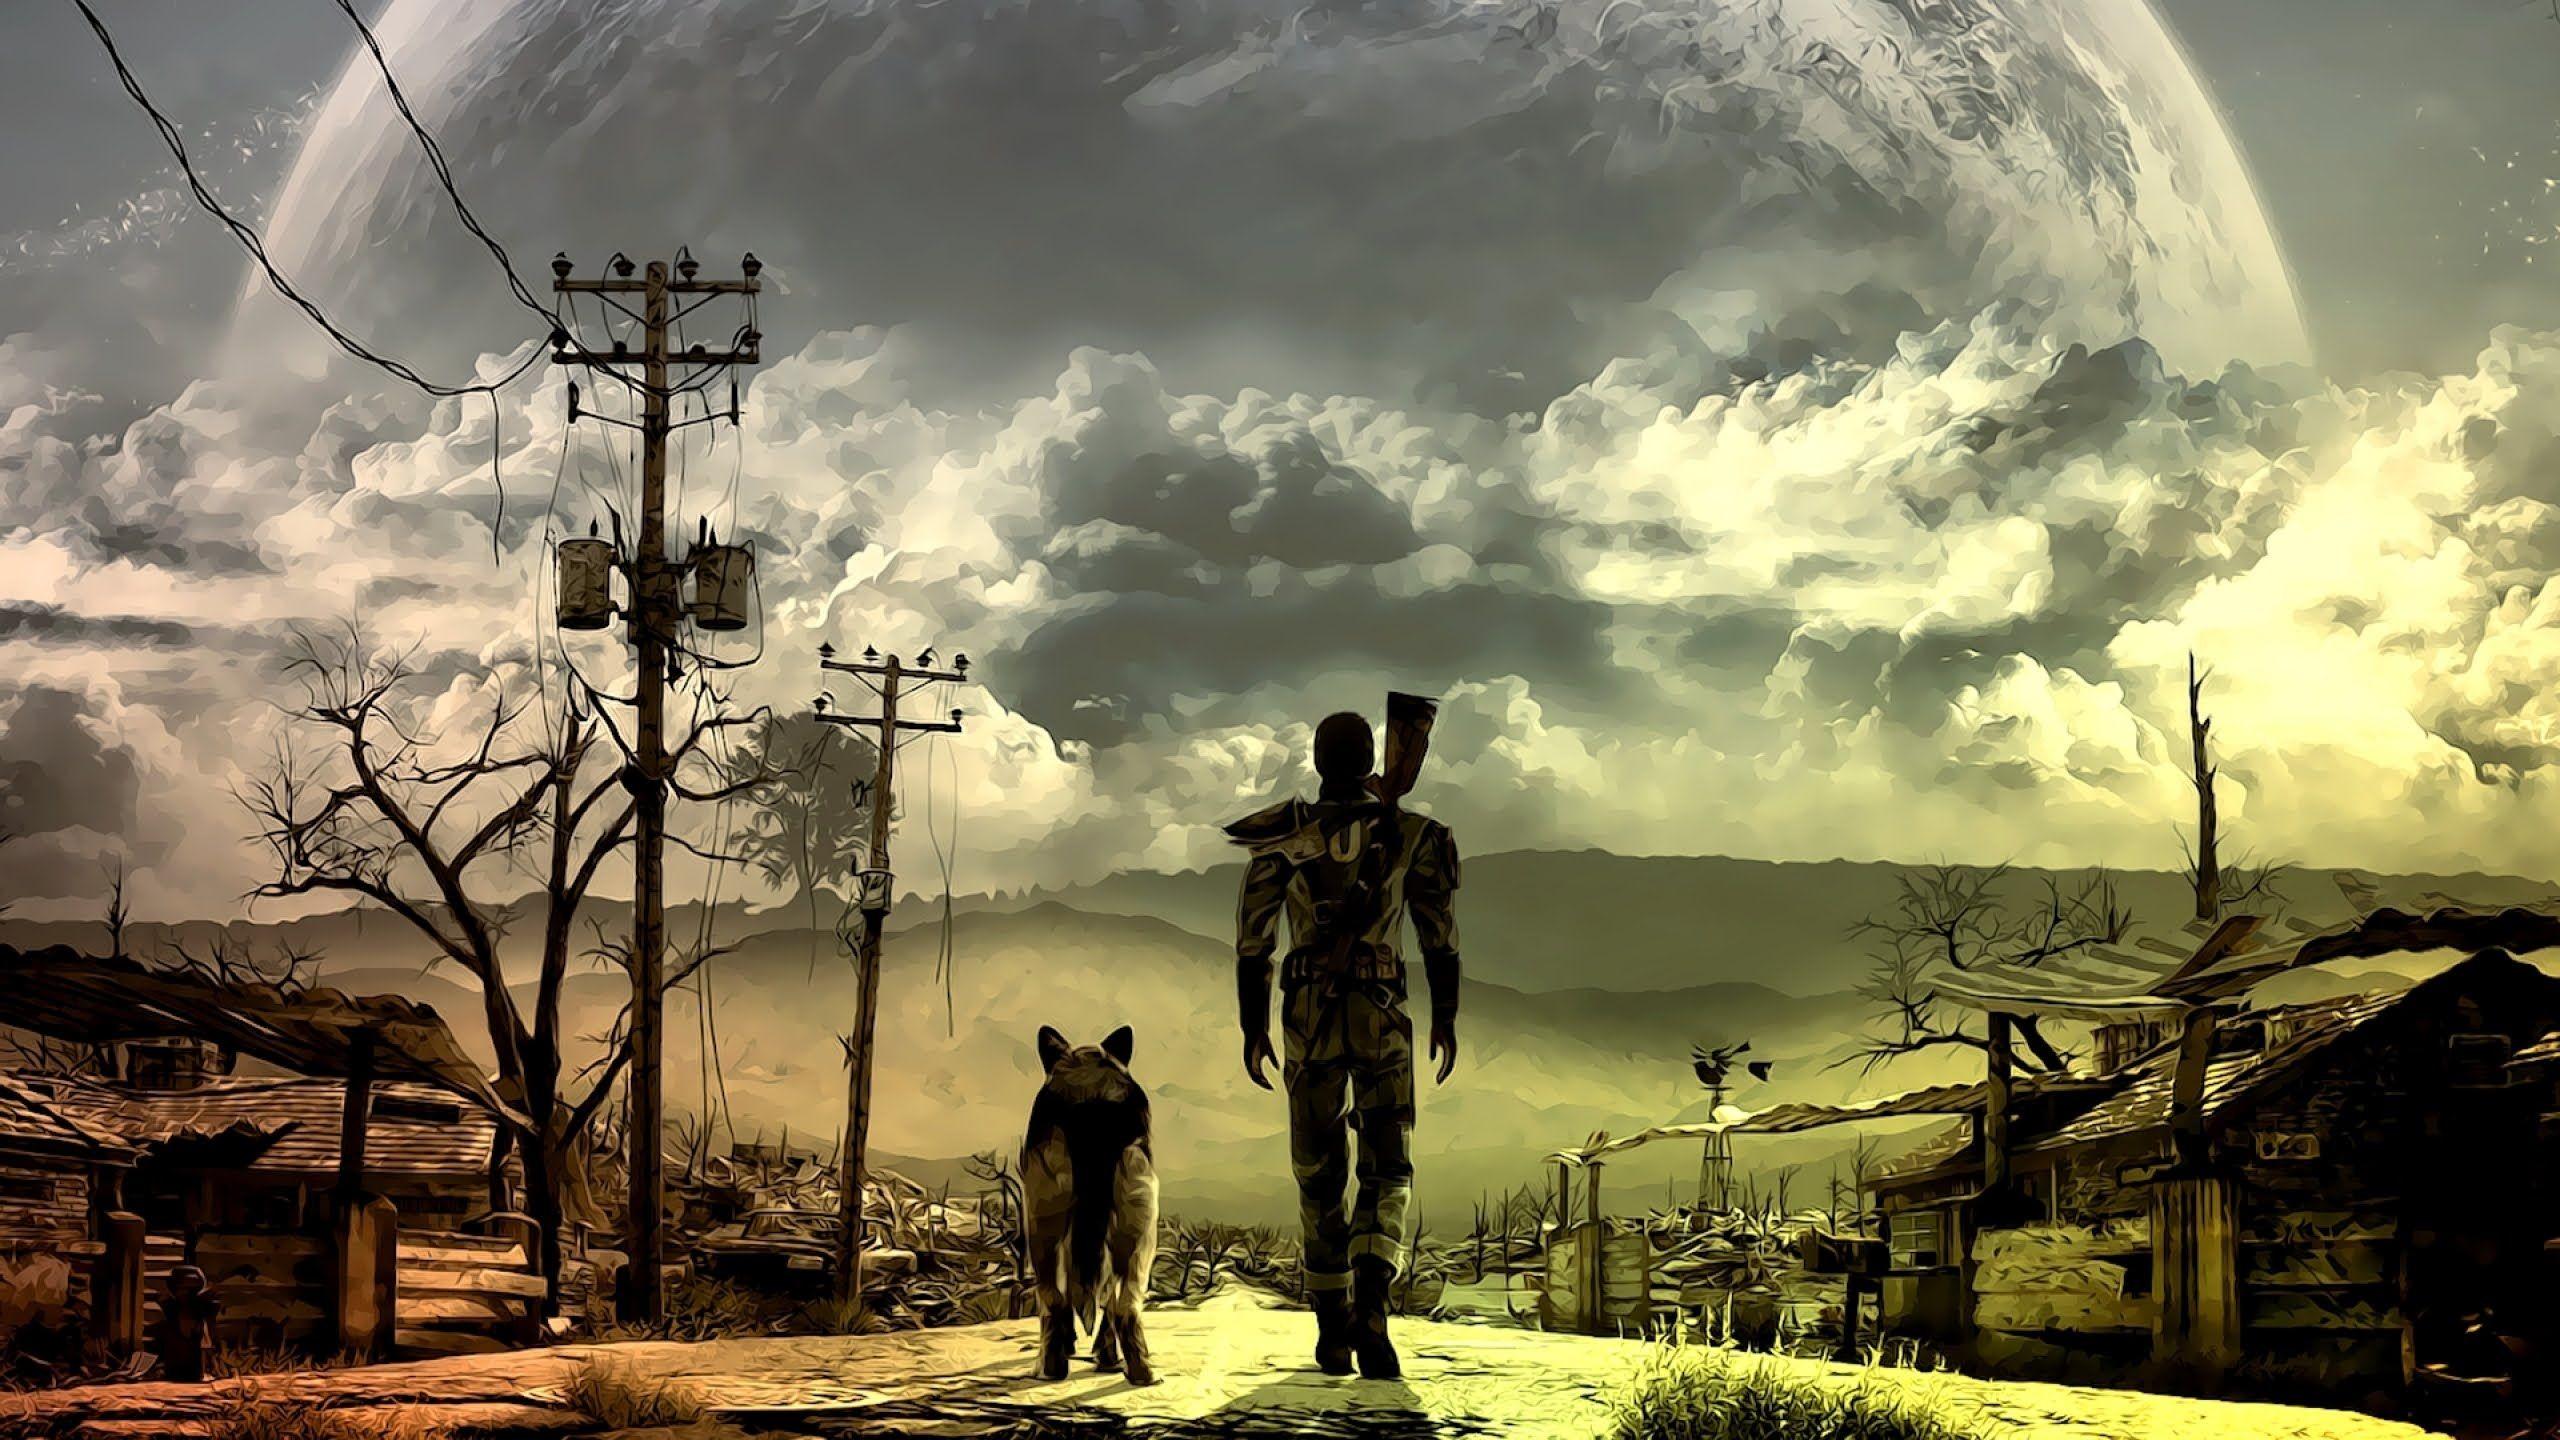 Fallout 4 Desktop Wallpaper (76+ Images